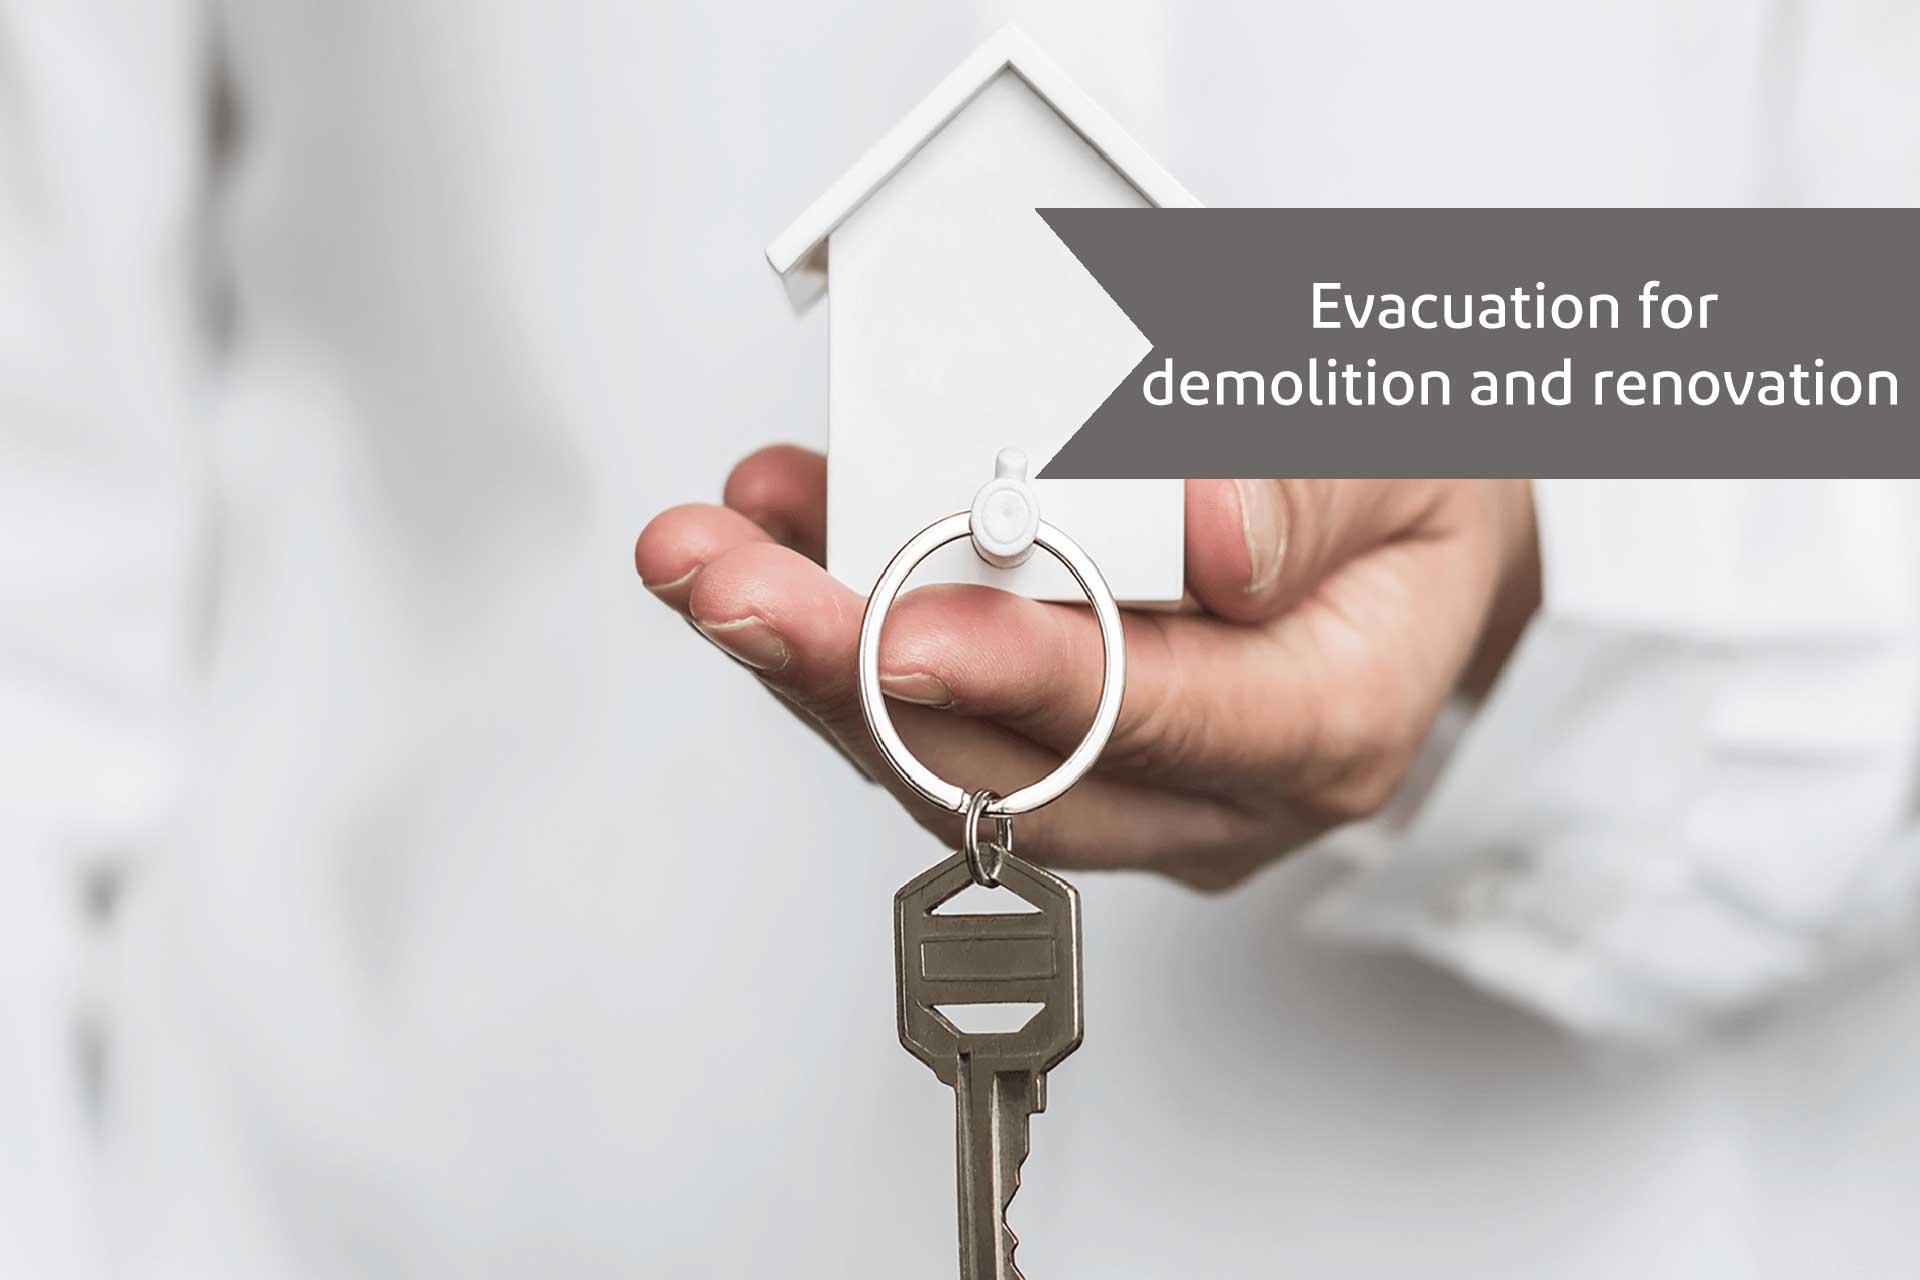 Evacuation for demolition and renovation - alemohamadlaw